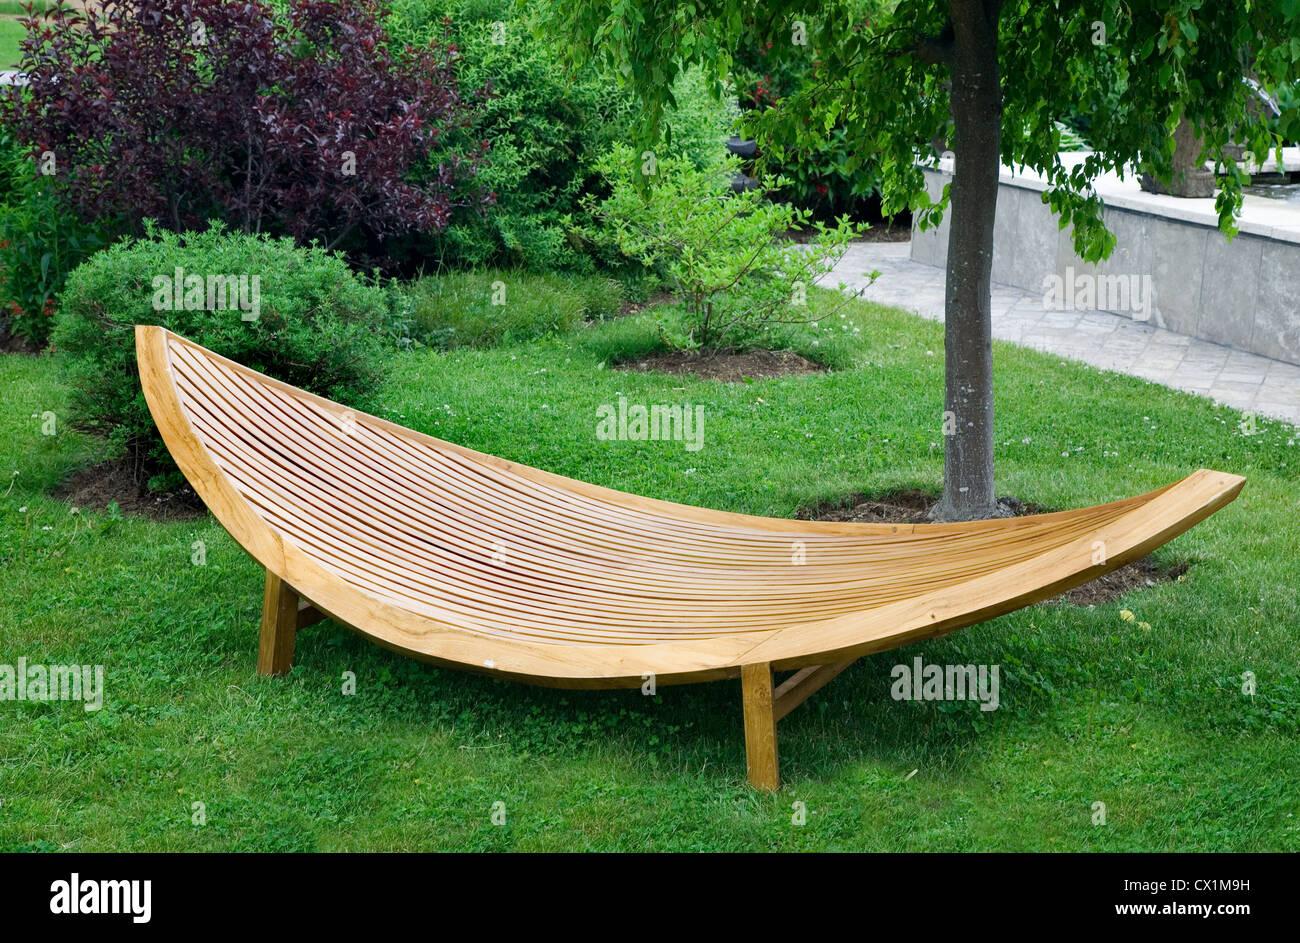 Beau Sleek Modern Garden Furniture Made Of Wood And Varnished.